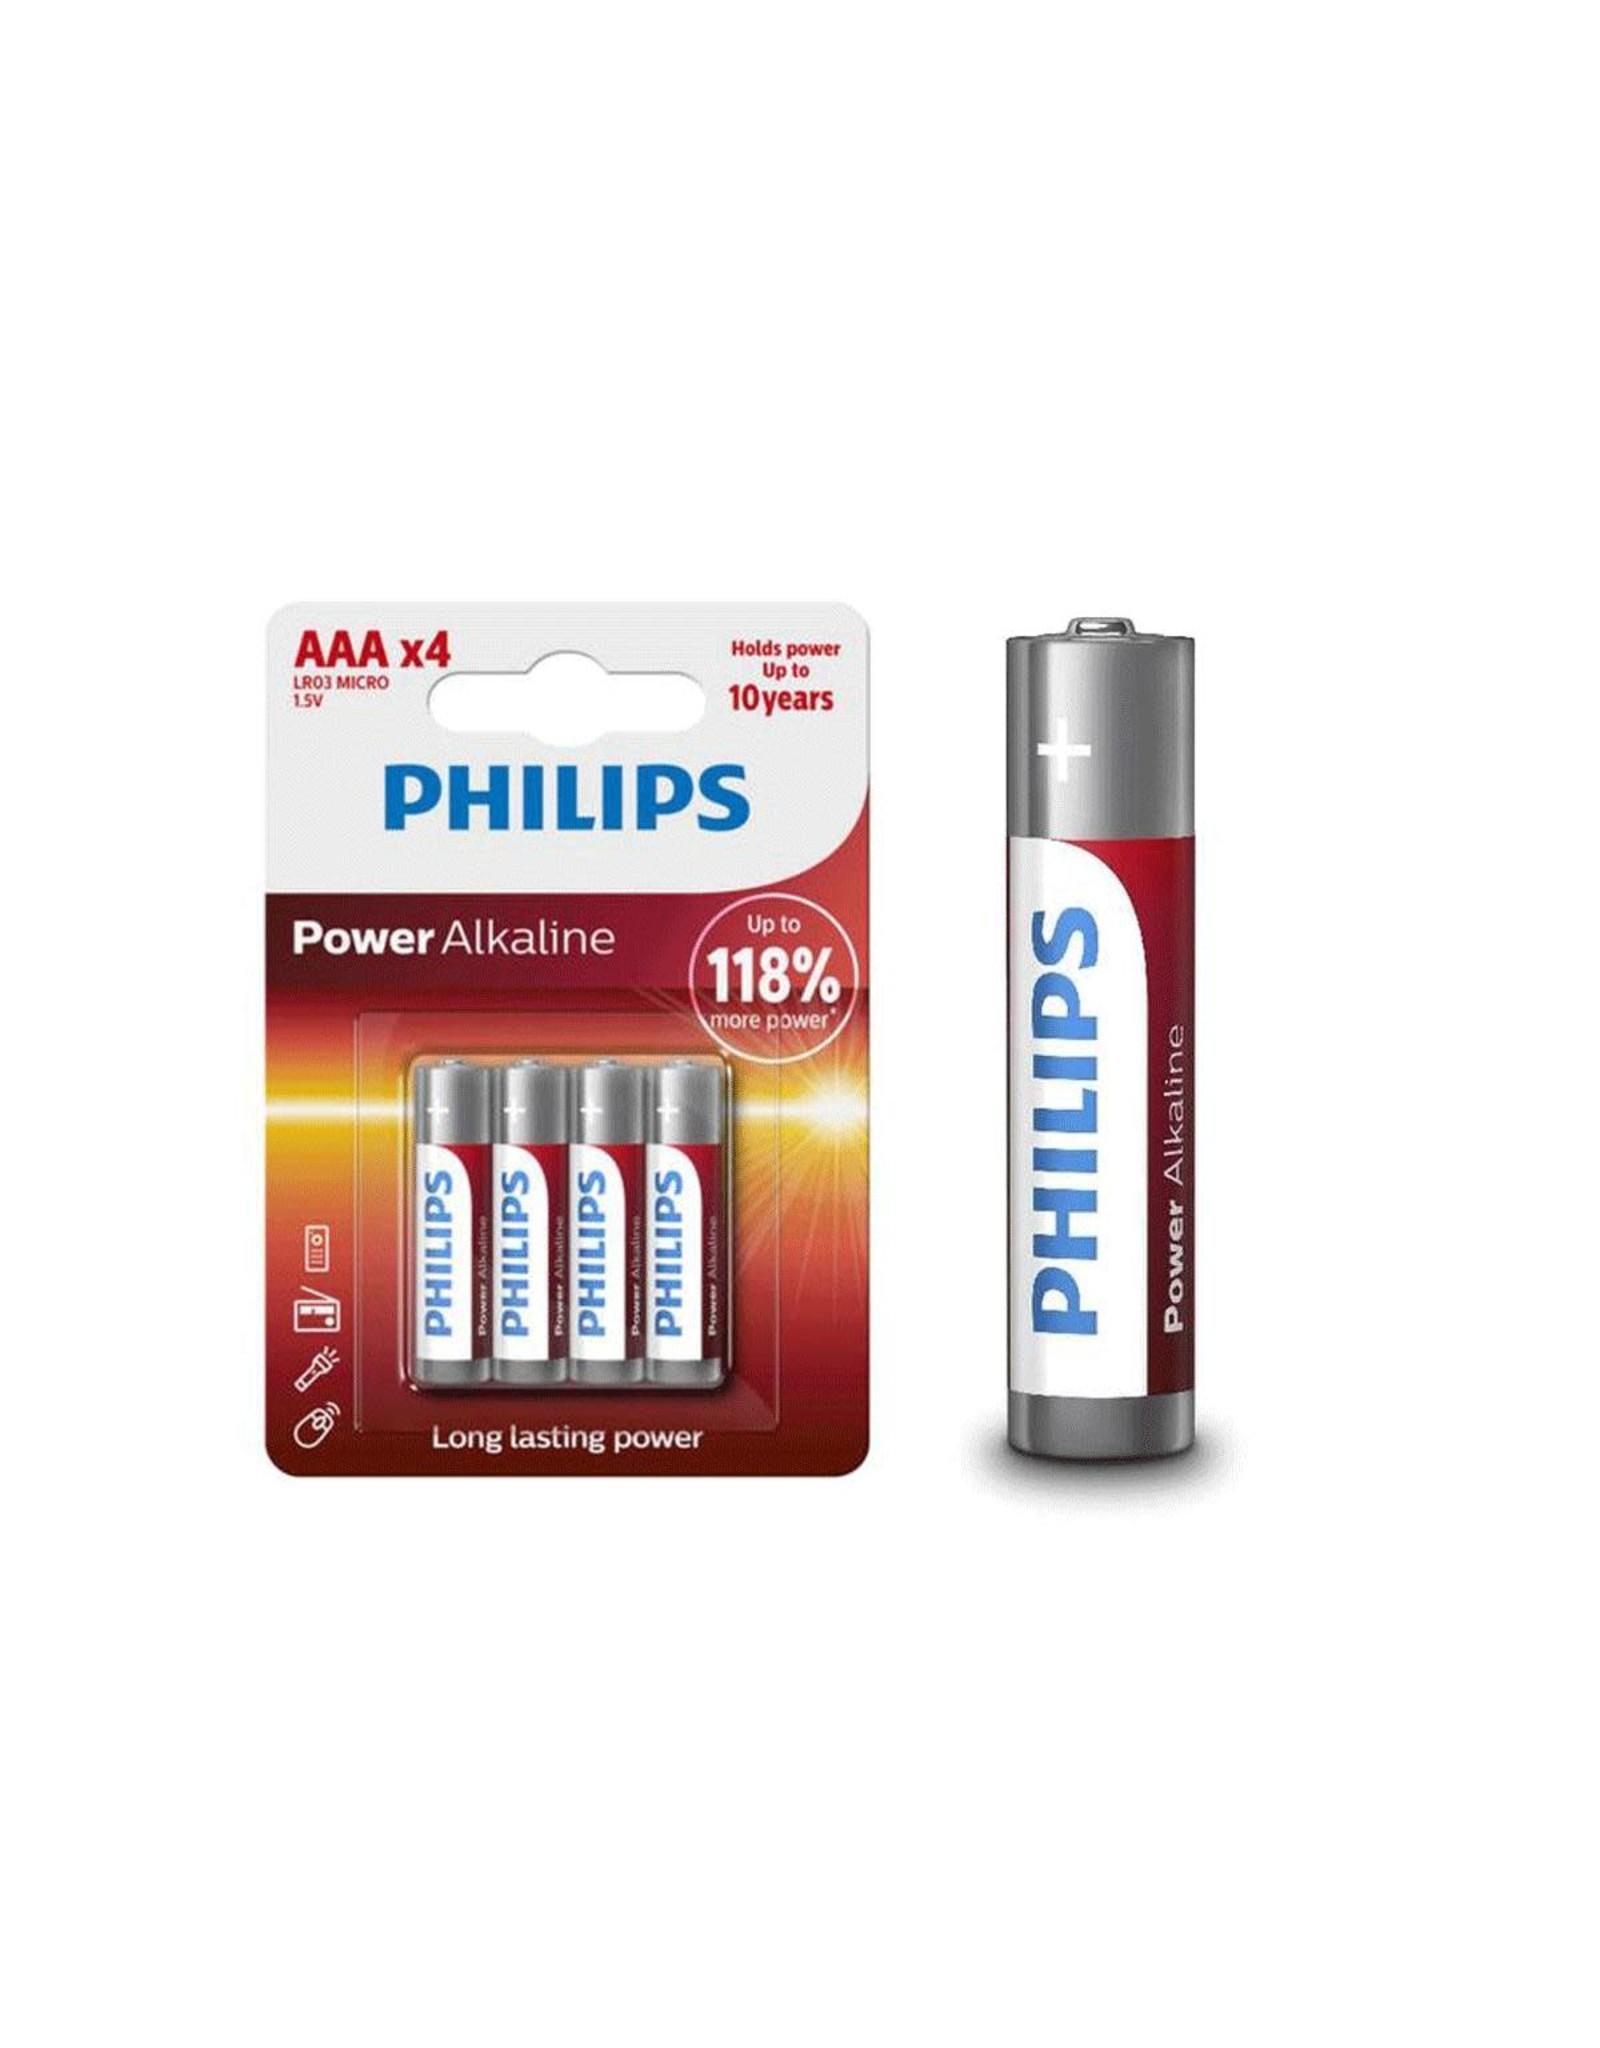 Philips Batteries Powerlife AAA x4